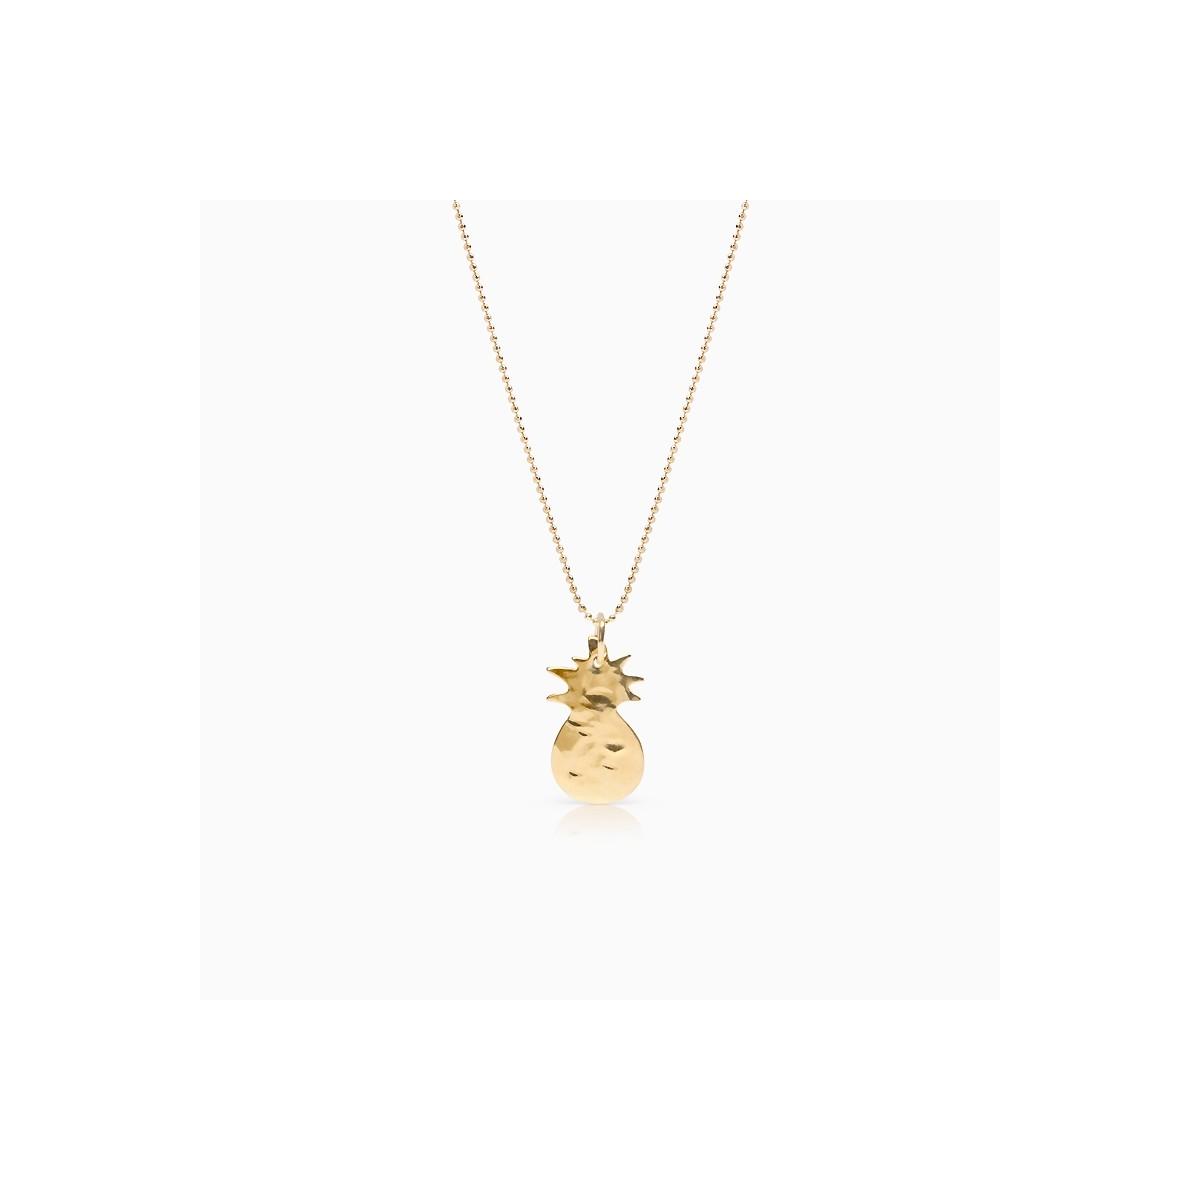 Necklace Boho Pineapple